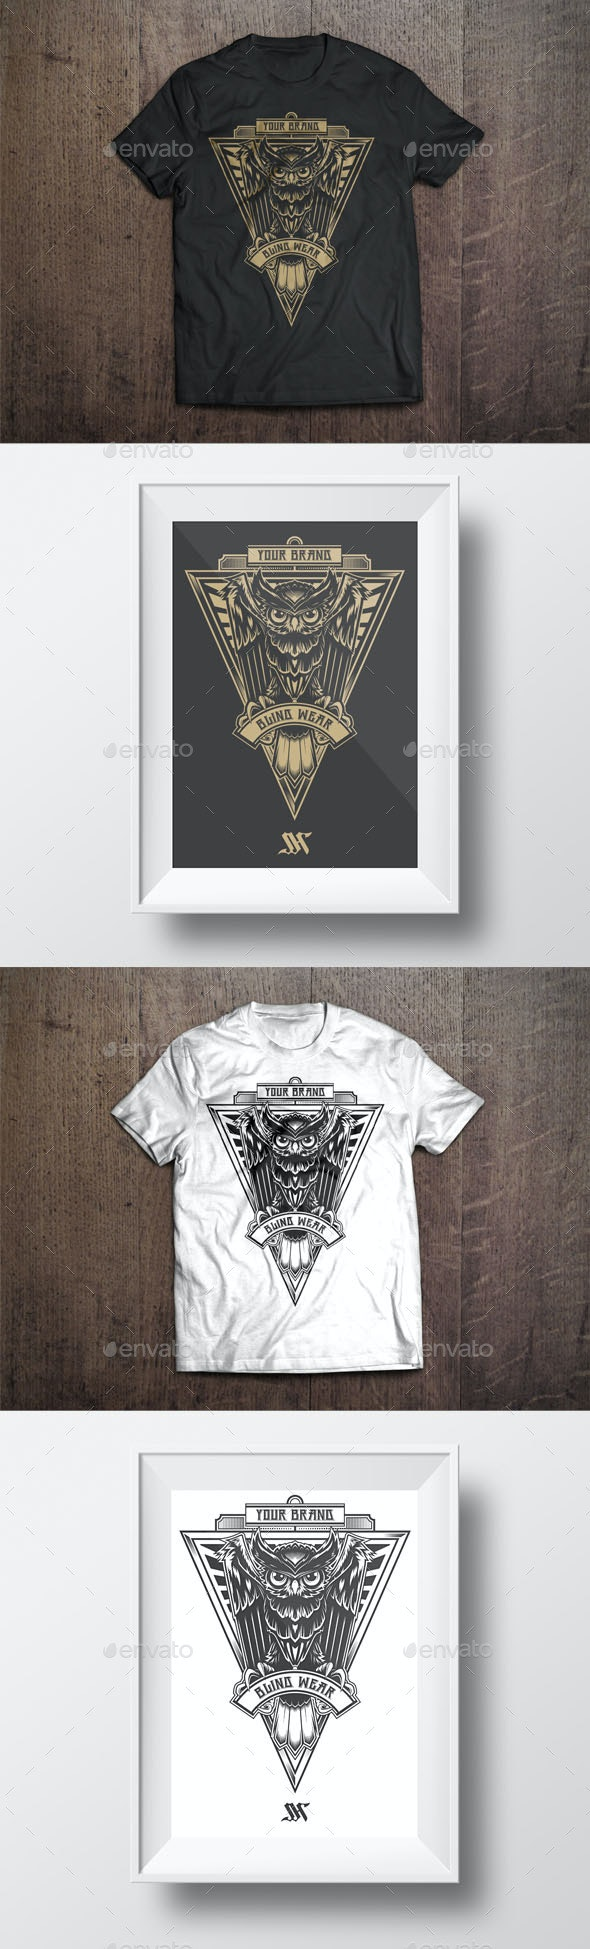 T-Shirt Illustration - Owl Theme - Designs T-Shirts